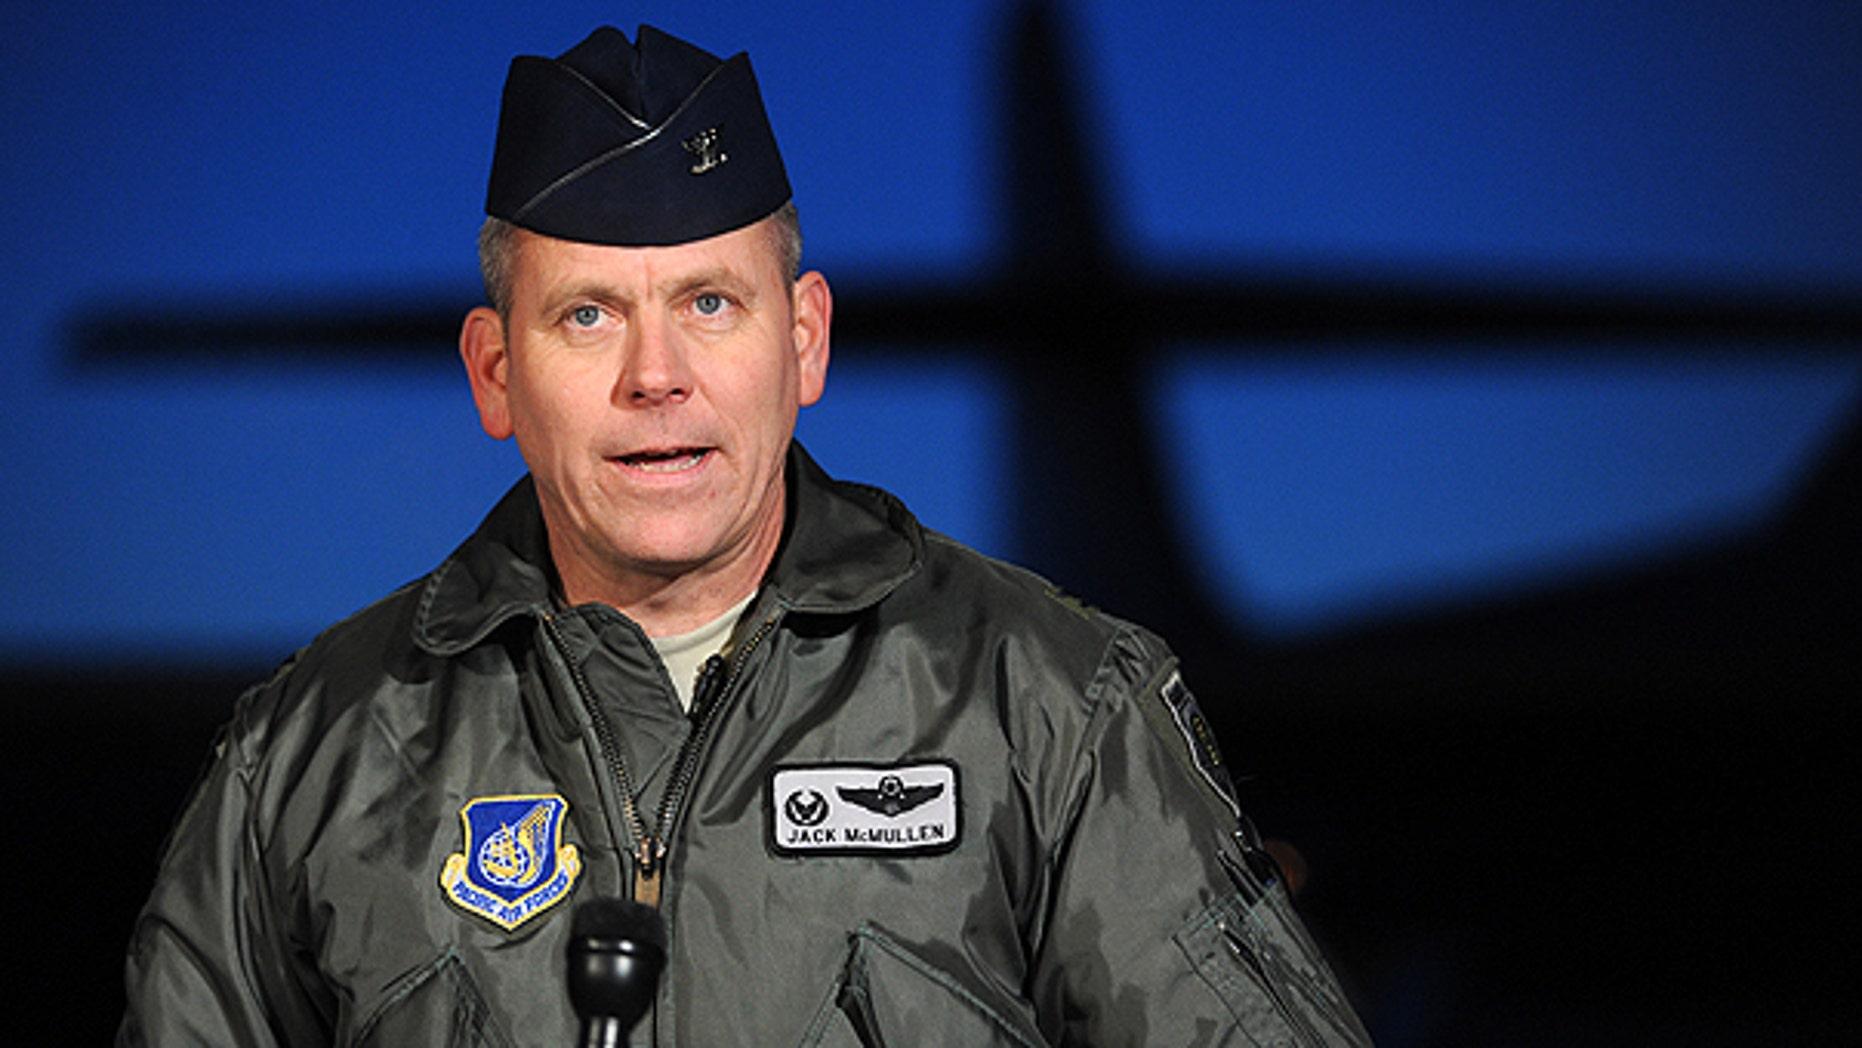 Nov. 19: Col. Jack McMullen, 3rd Wing commander, announces the death of pilot Capt. Jeff Haney based on evidence at the F-22 Raptor crash site.